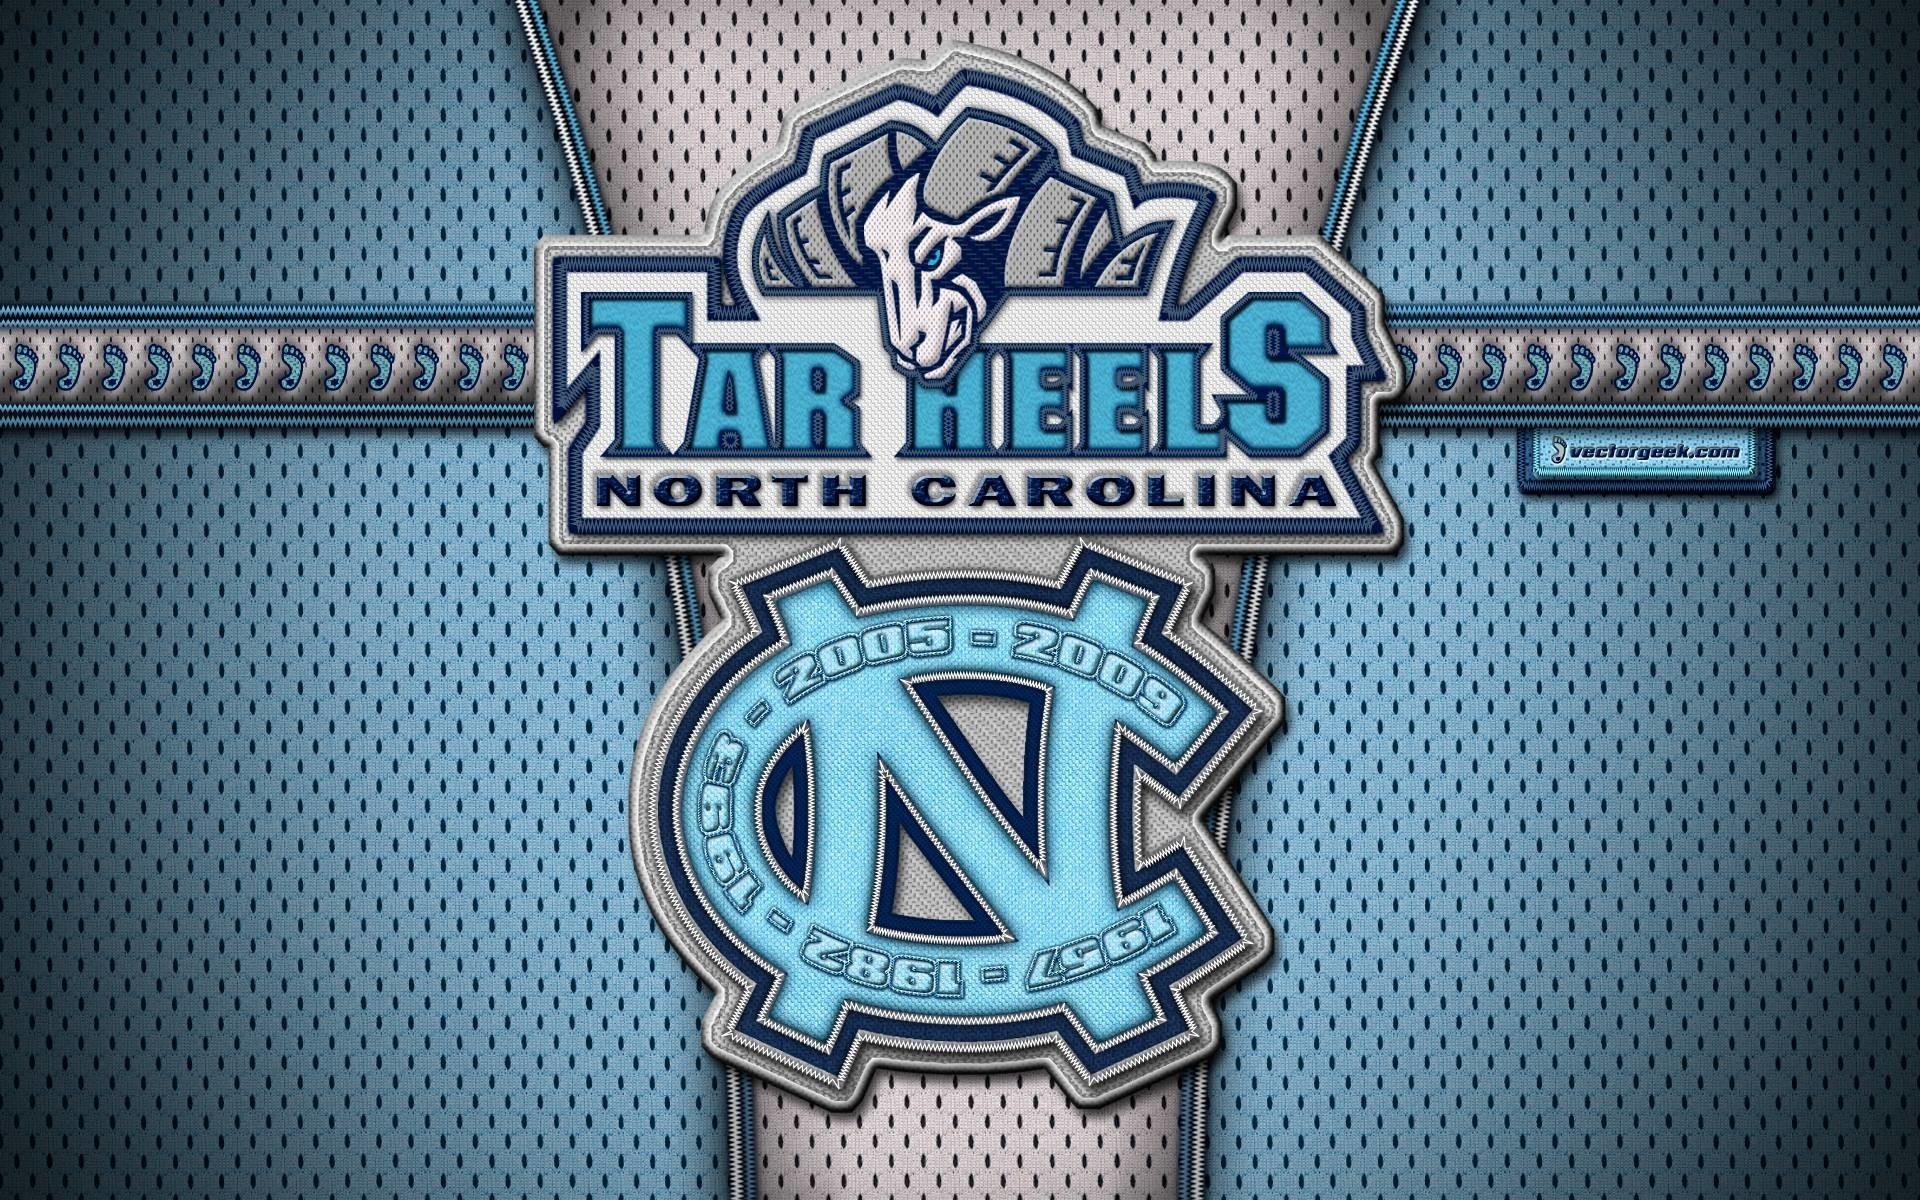 North carolina tar heels wallpapers 58 images - Nc state iphone 5 wallpaper ...